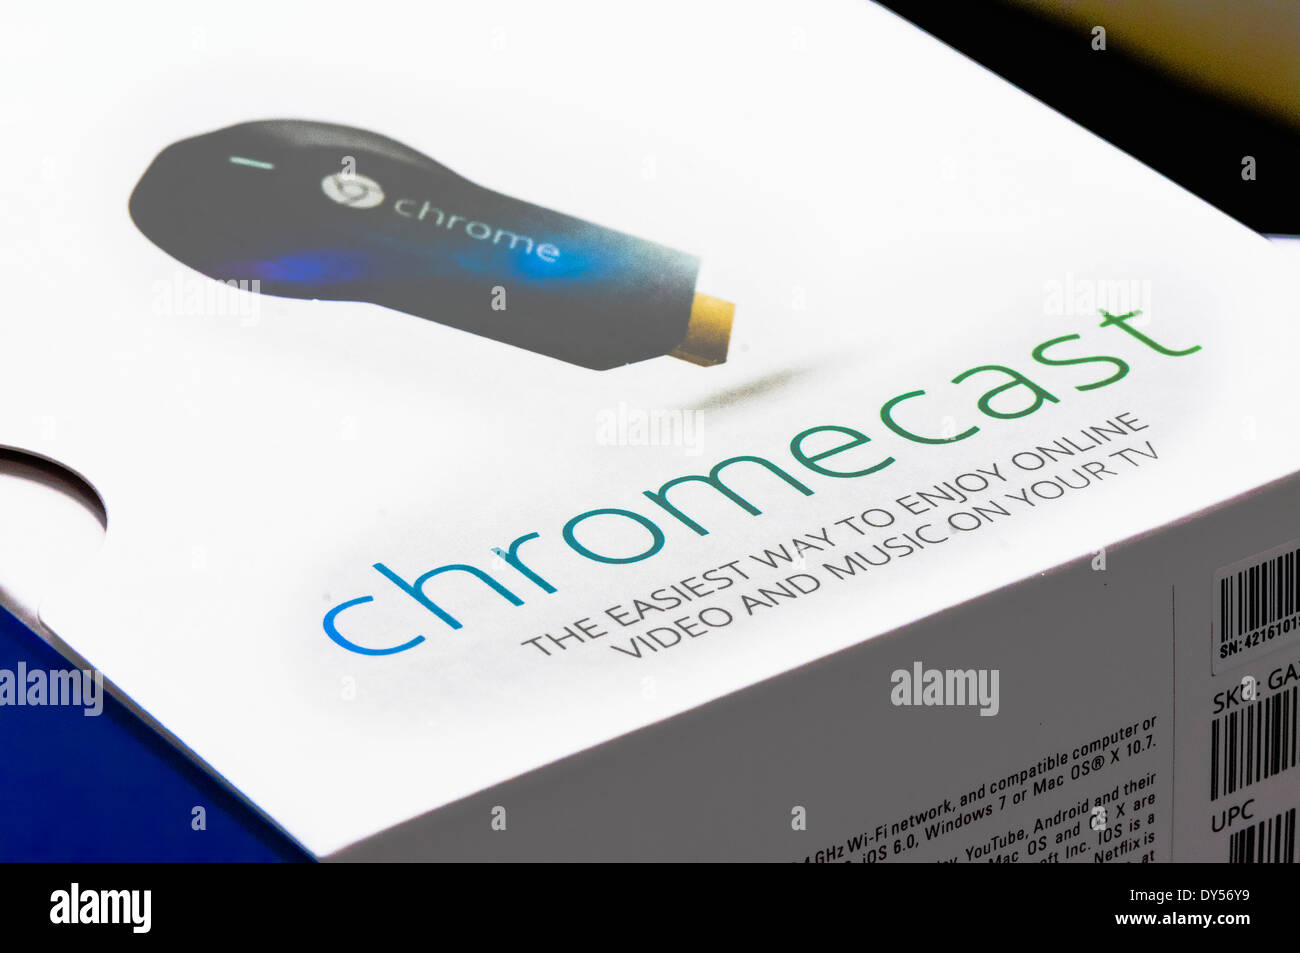 Google Chromecast TV streaming device - Stock Image